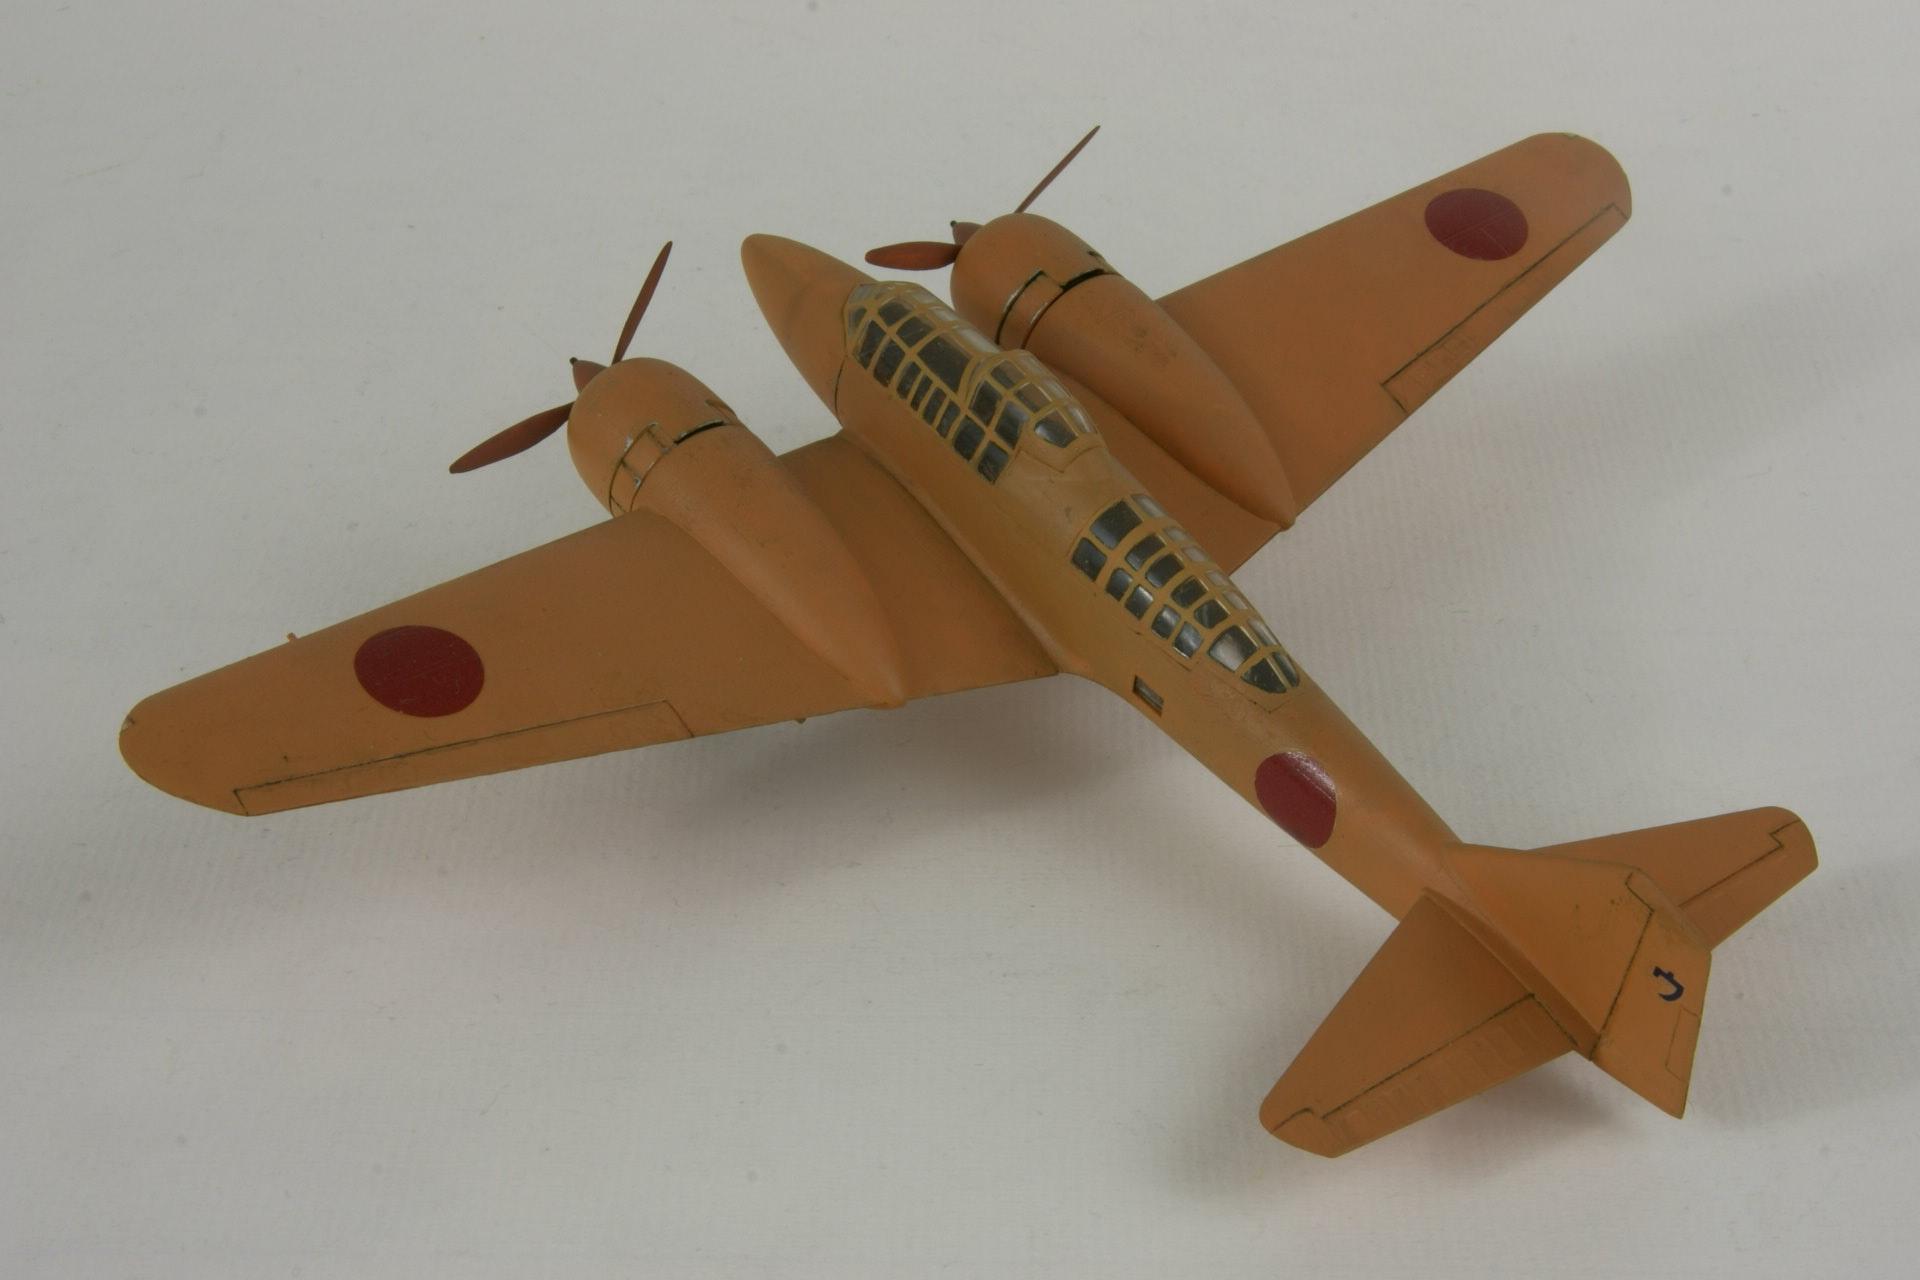 Mitsubishi ki 46 ii type 100 dinah 2 1